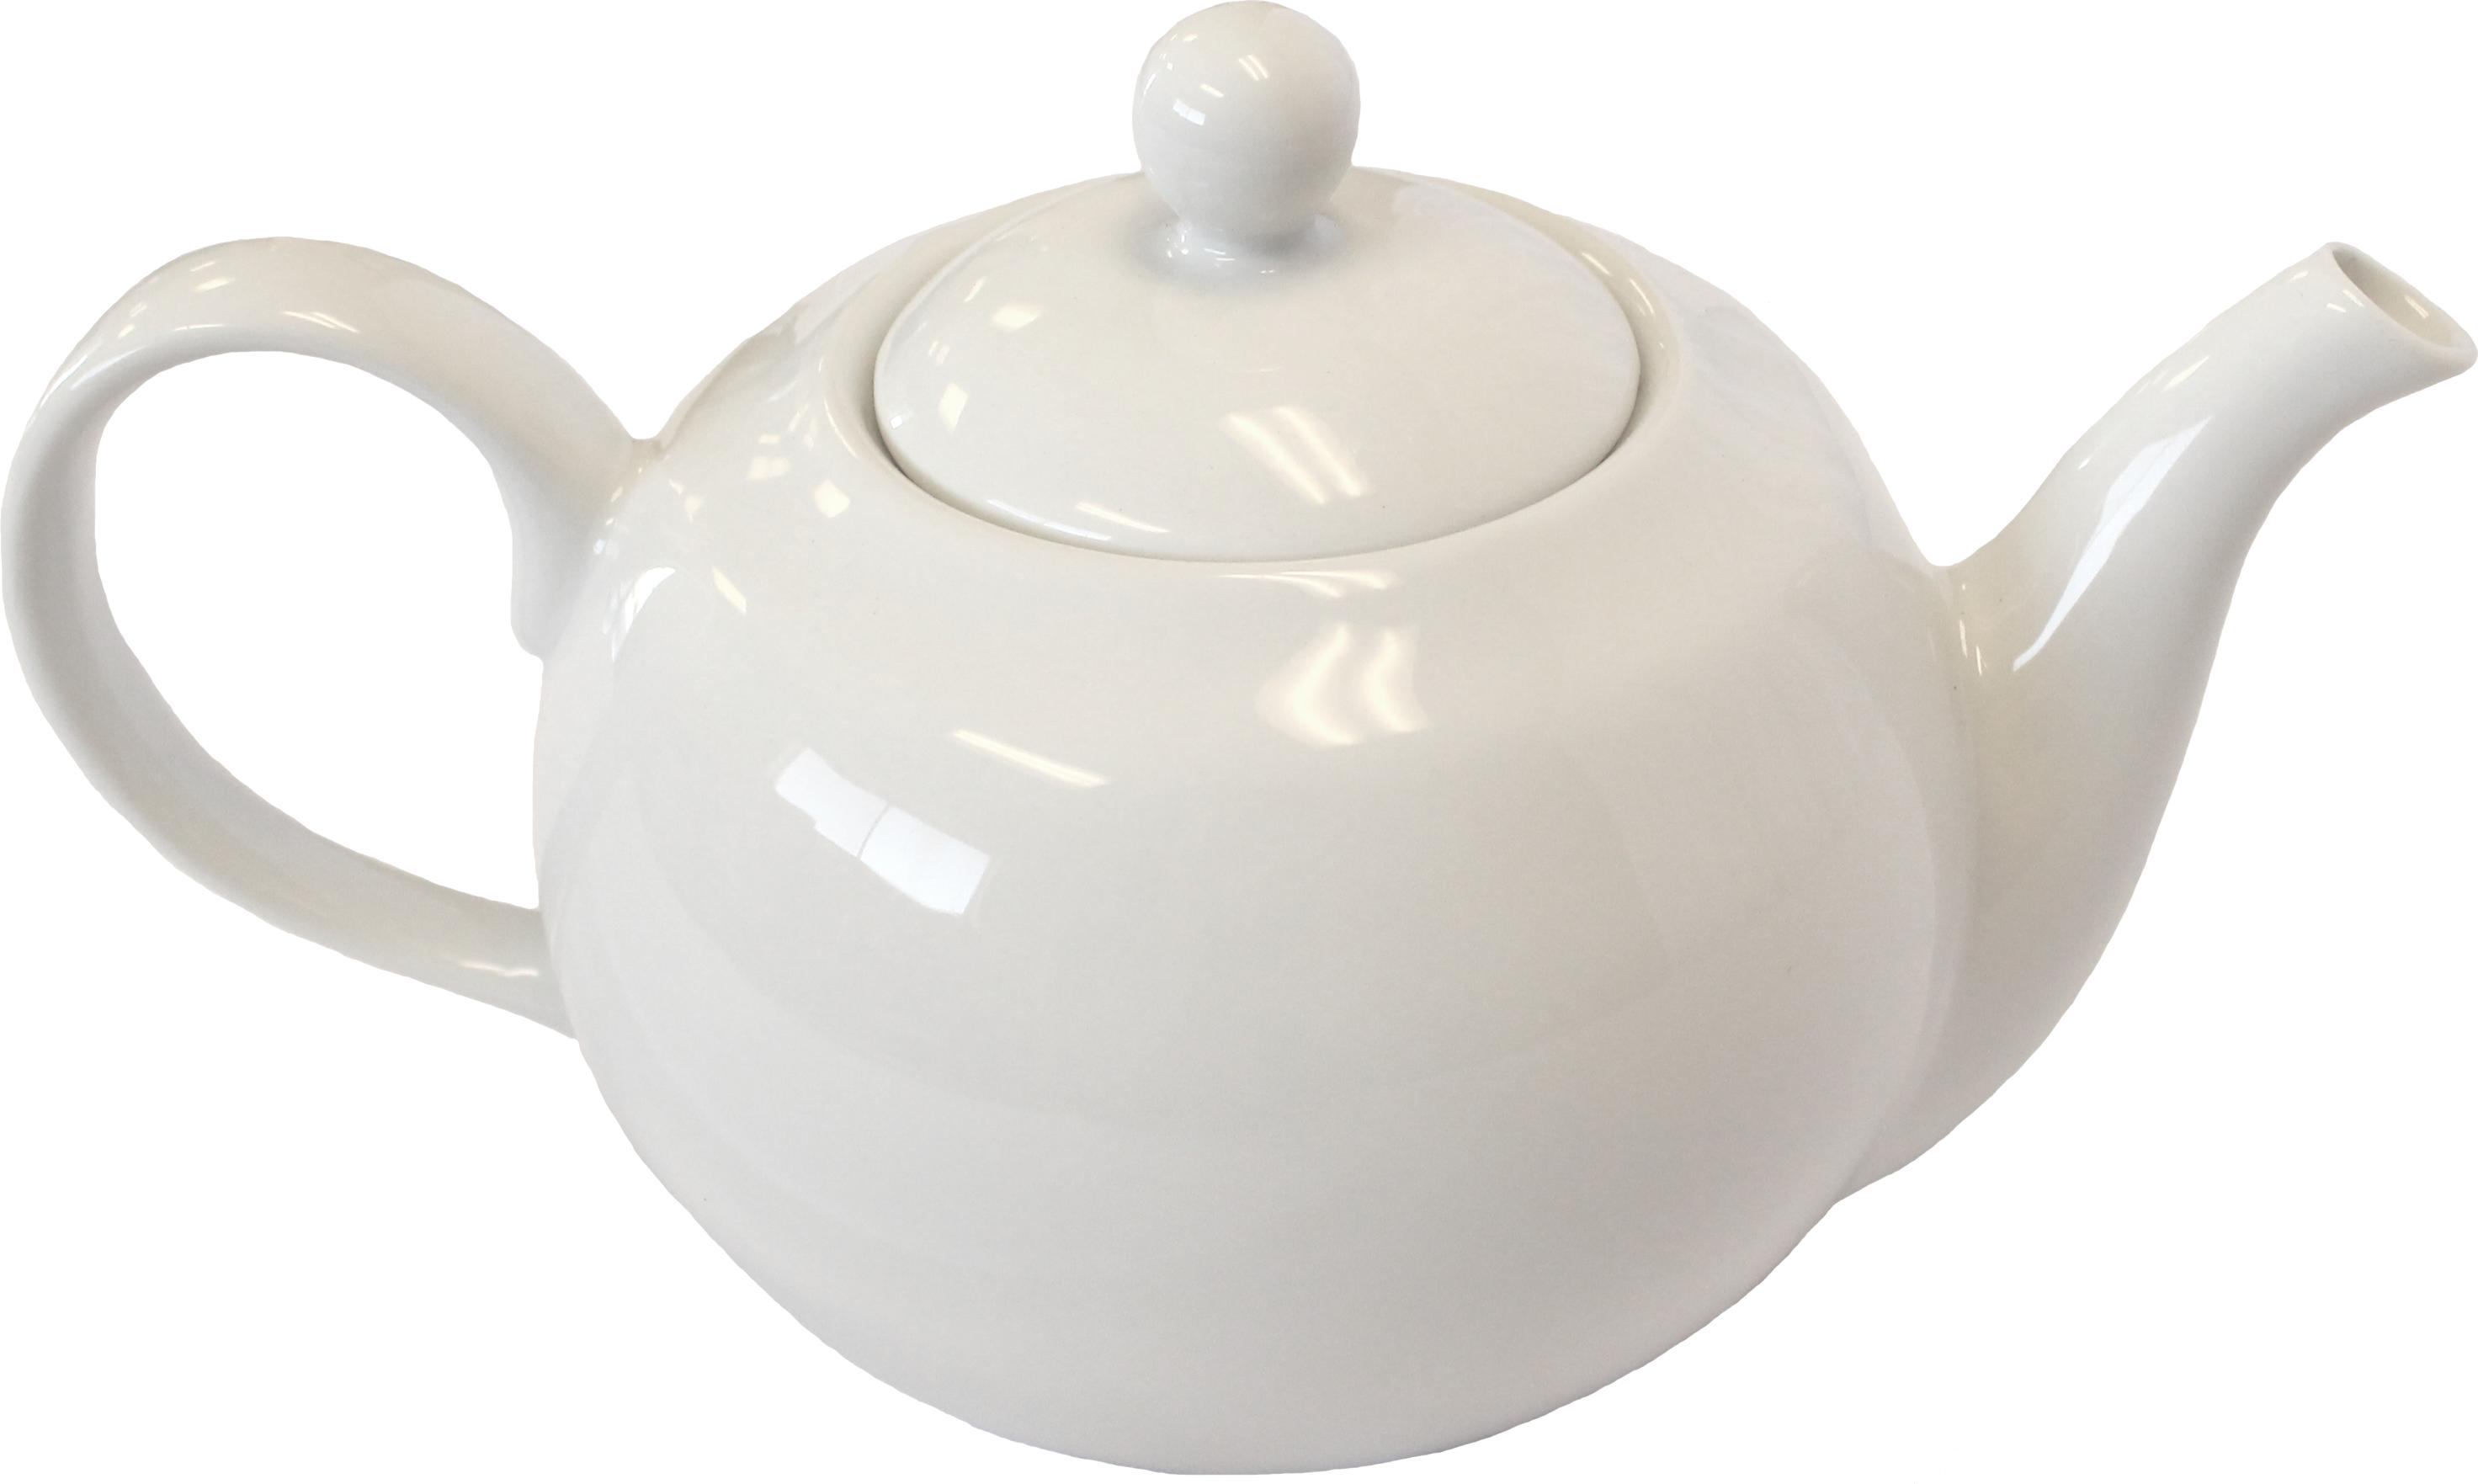 Kettle PNG image free download, tea kettle PNG.